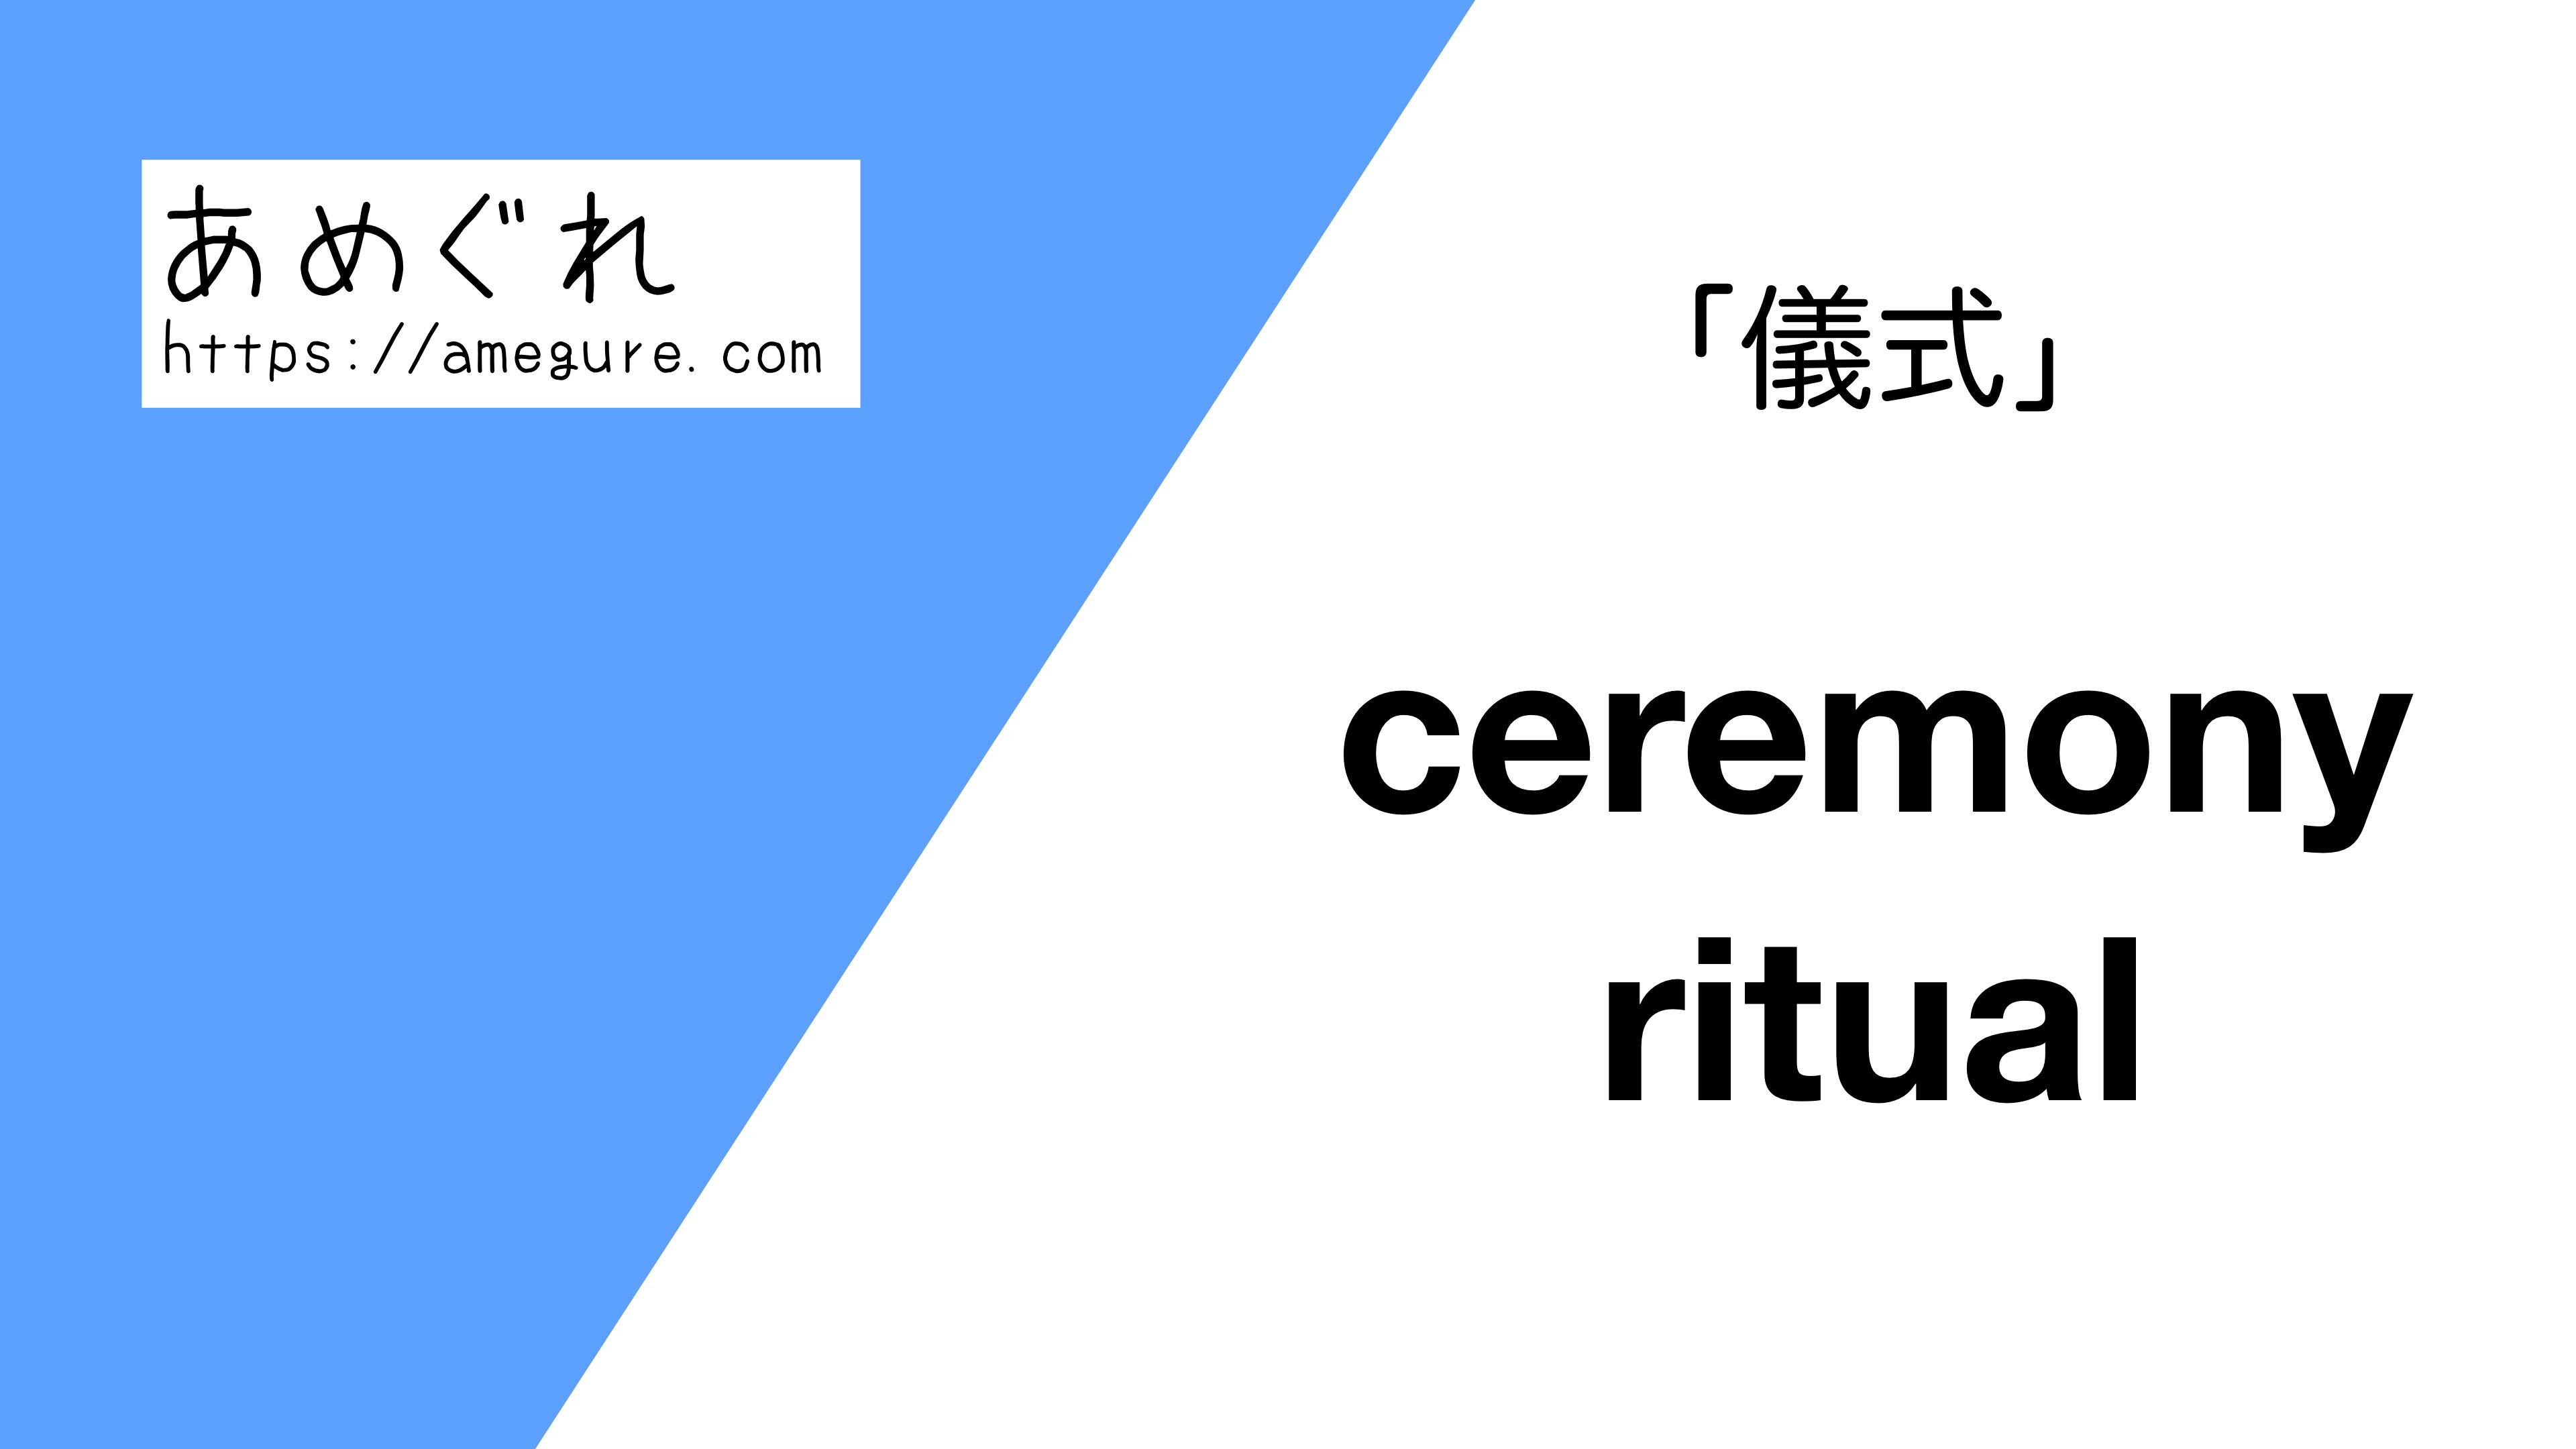 ceremony-ritual違い